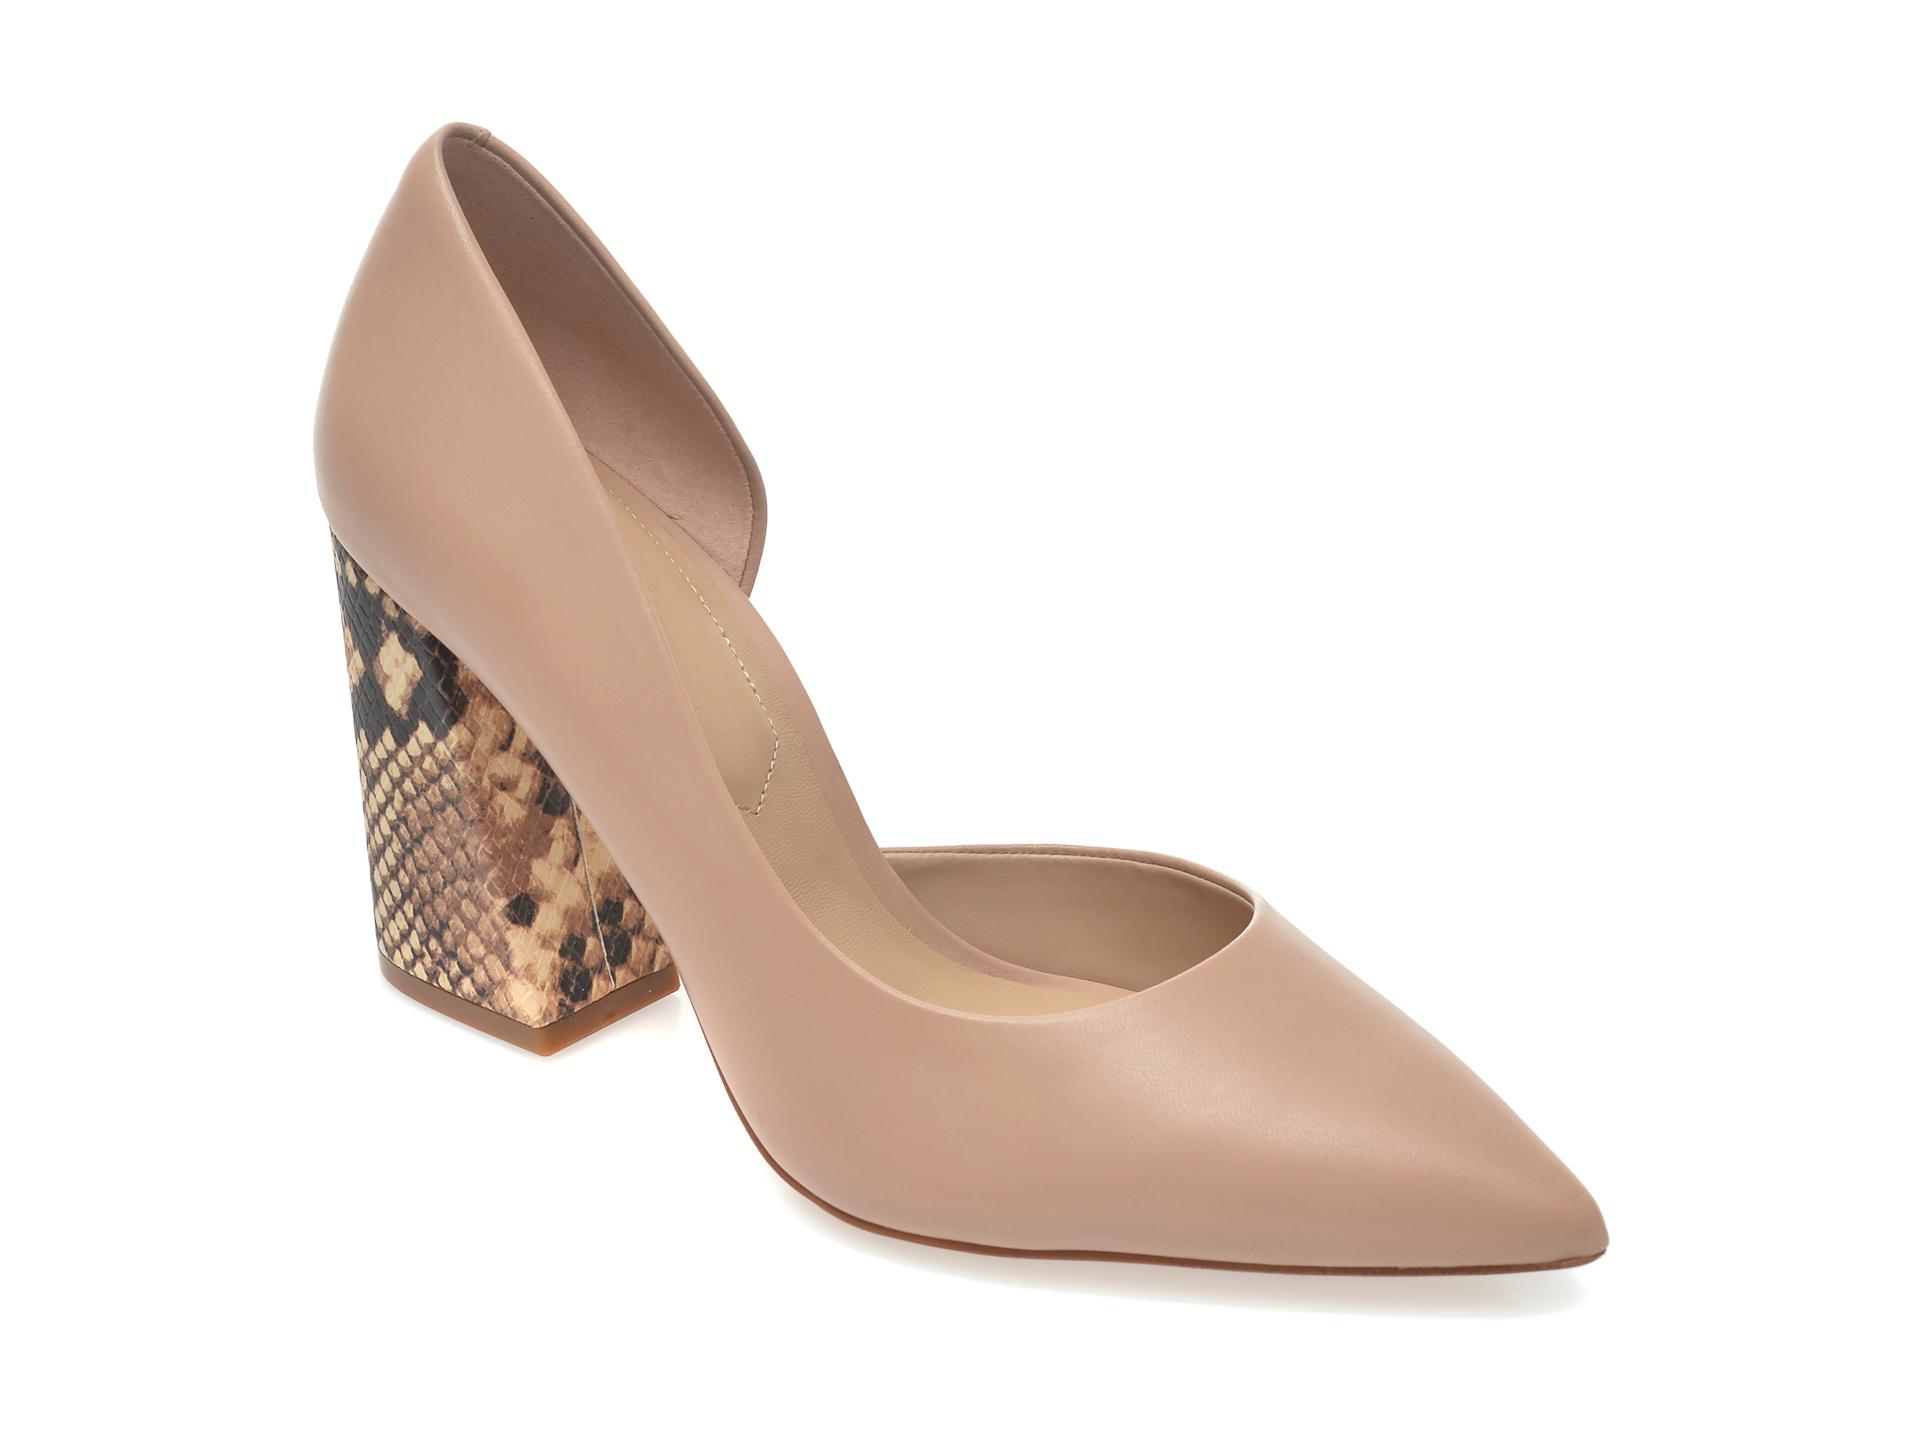 Pantofi ALDO nude, Ushari270, din piele naturala imagine otter.ro 2021